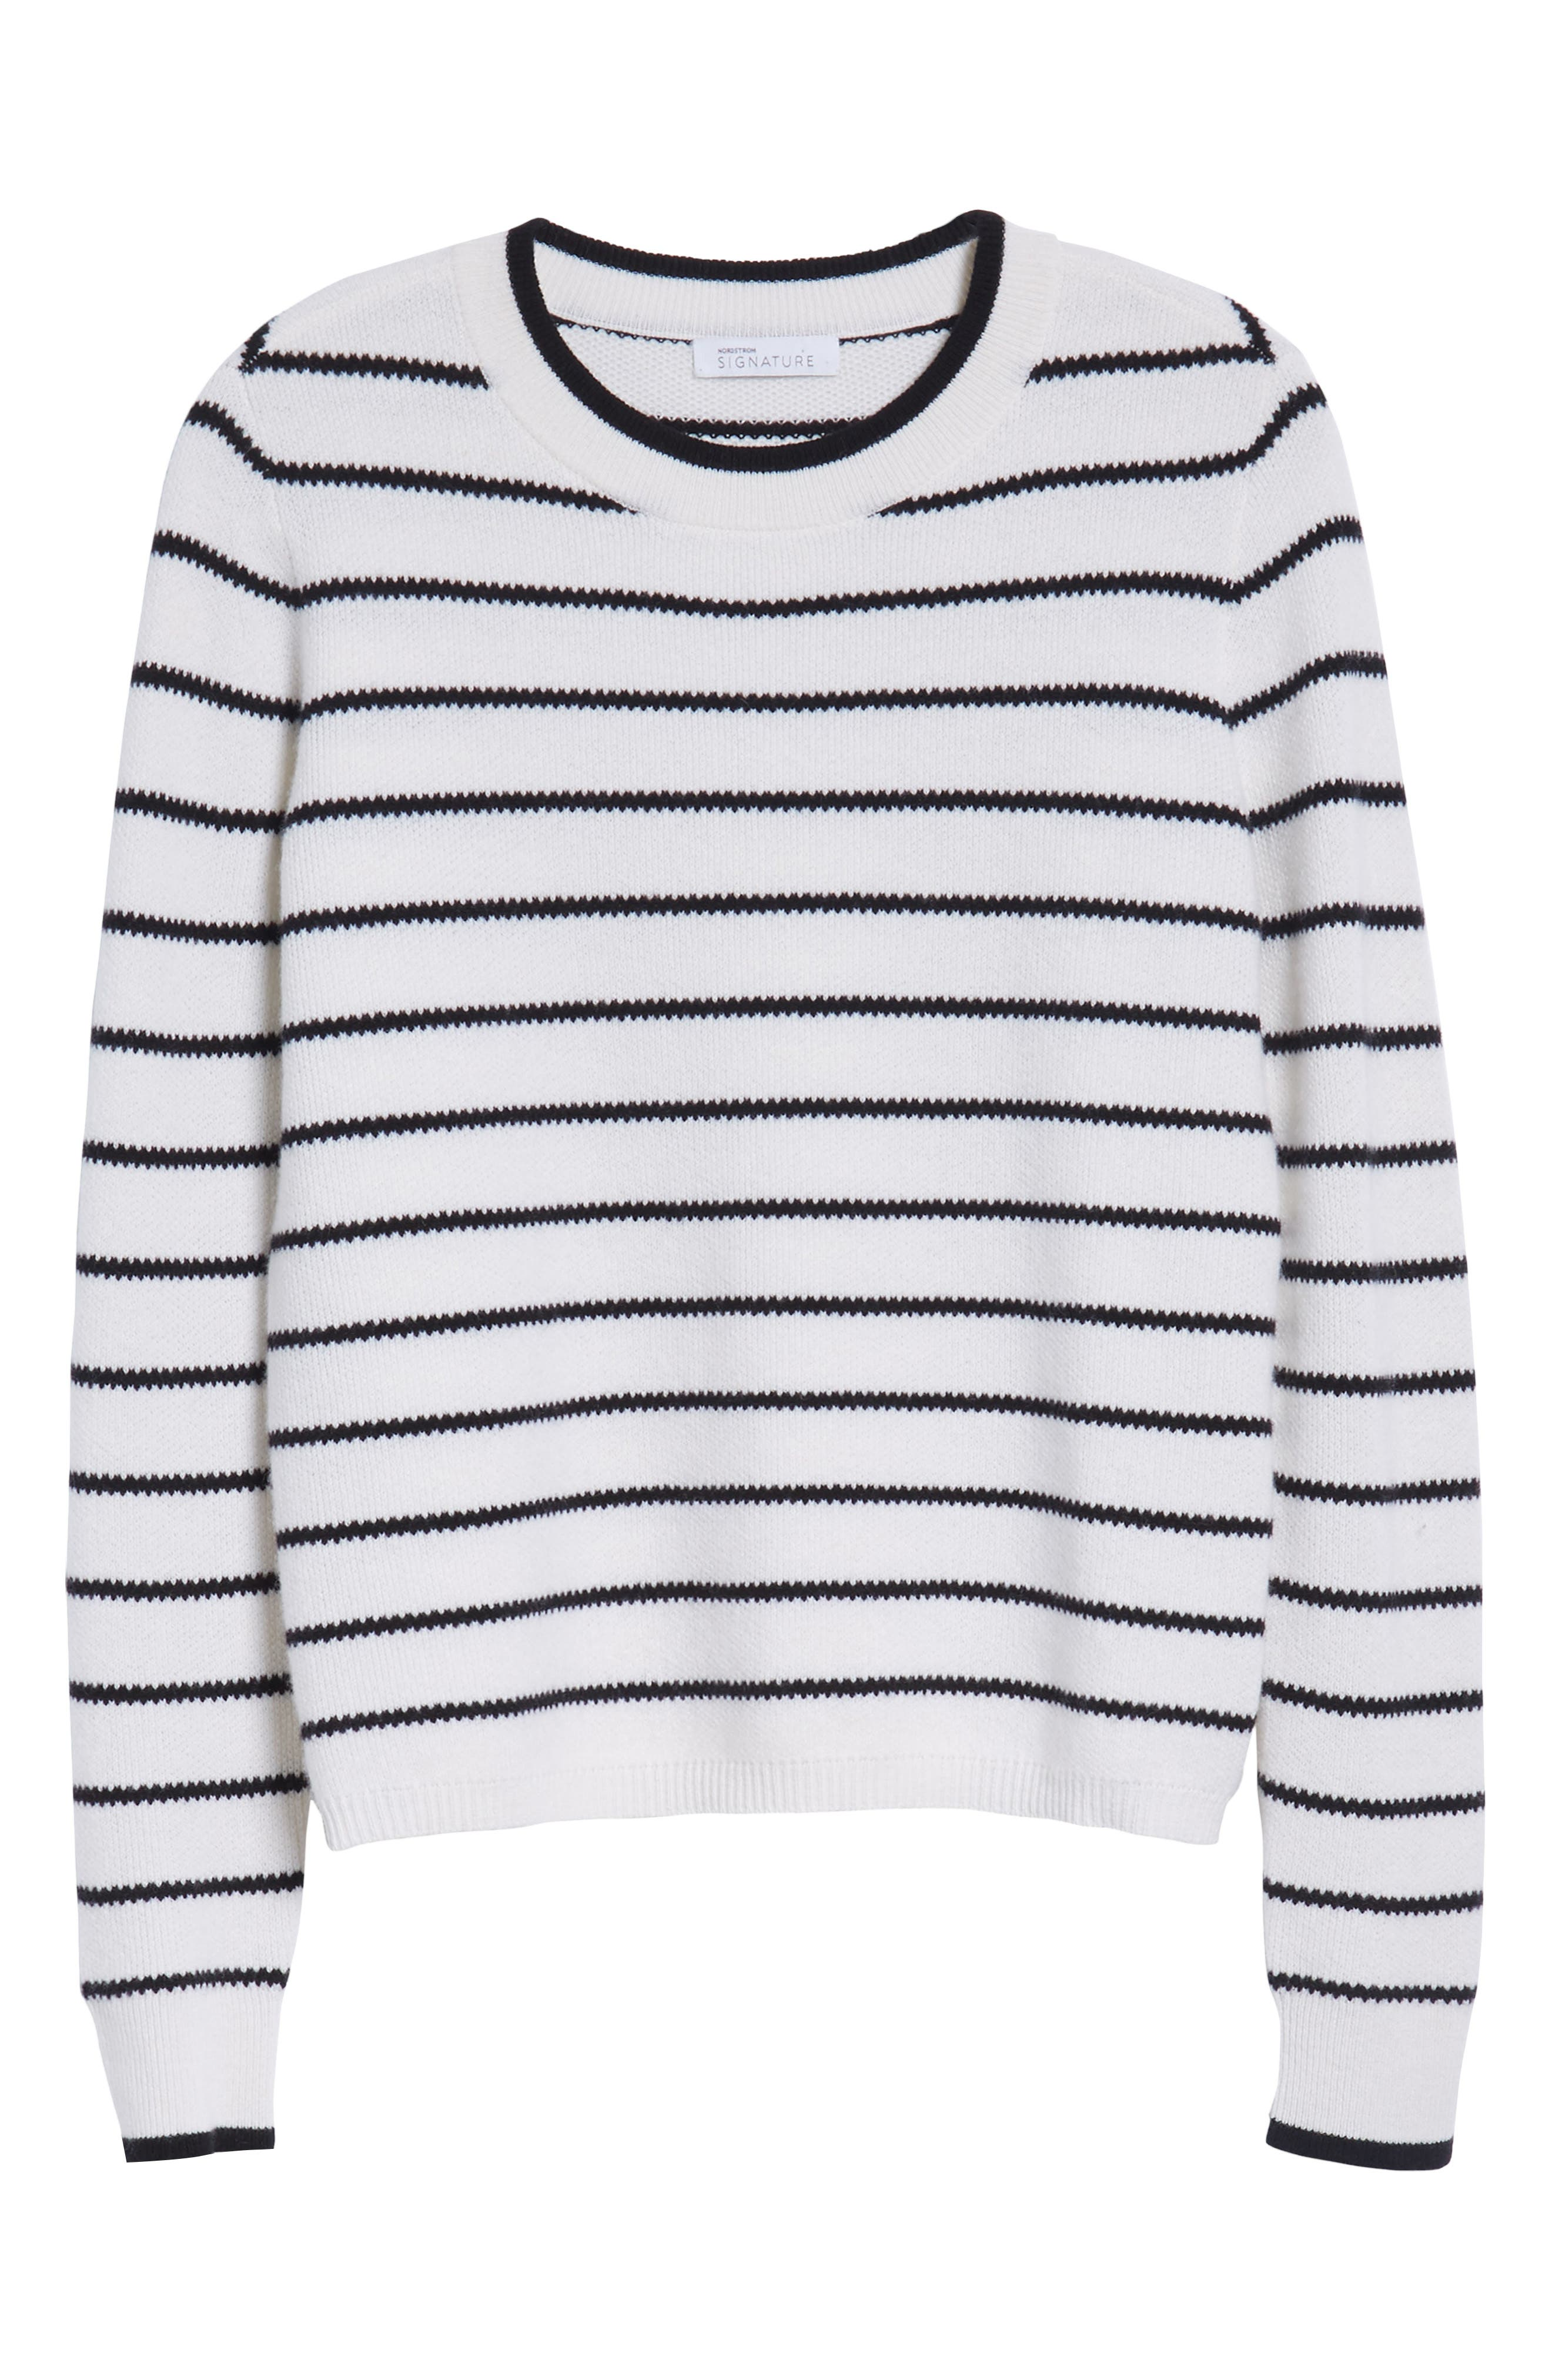 Stripe Cashmere Sweater,                             Alternate thumbnail 9, color,                             Ivory- Black Stripe